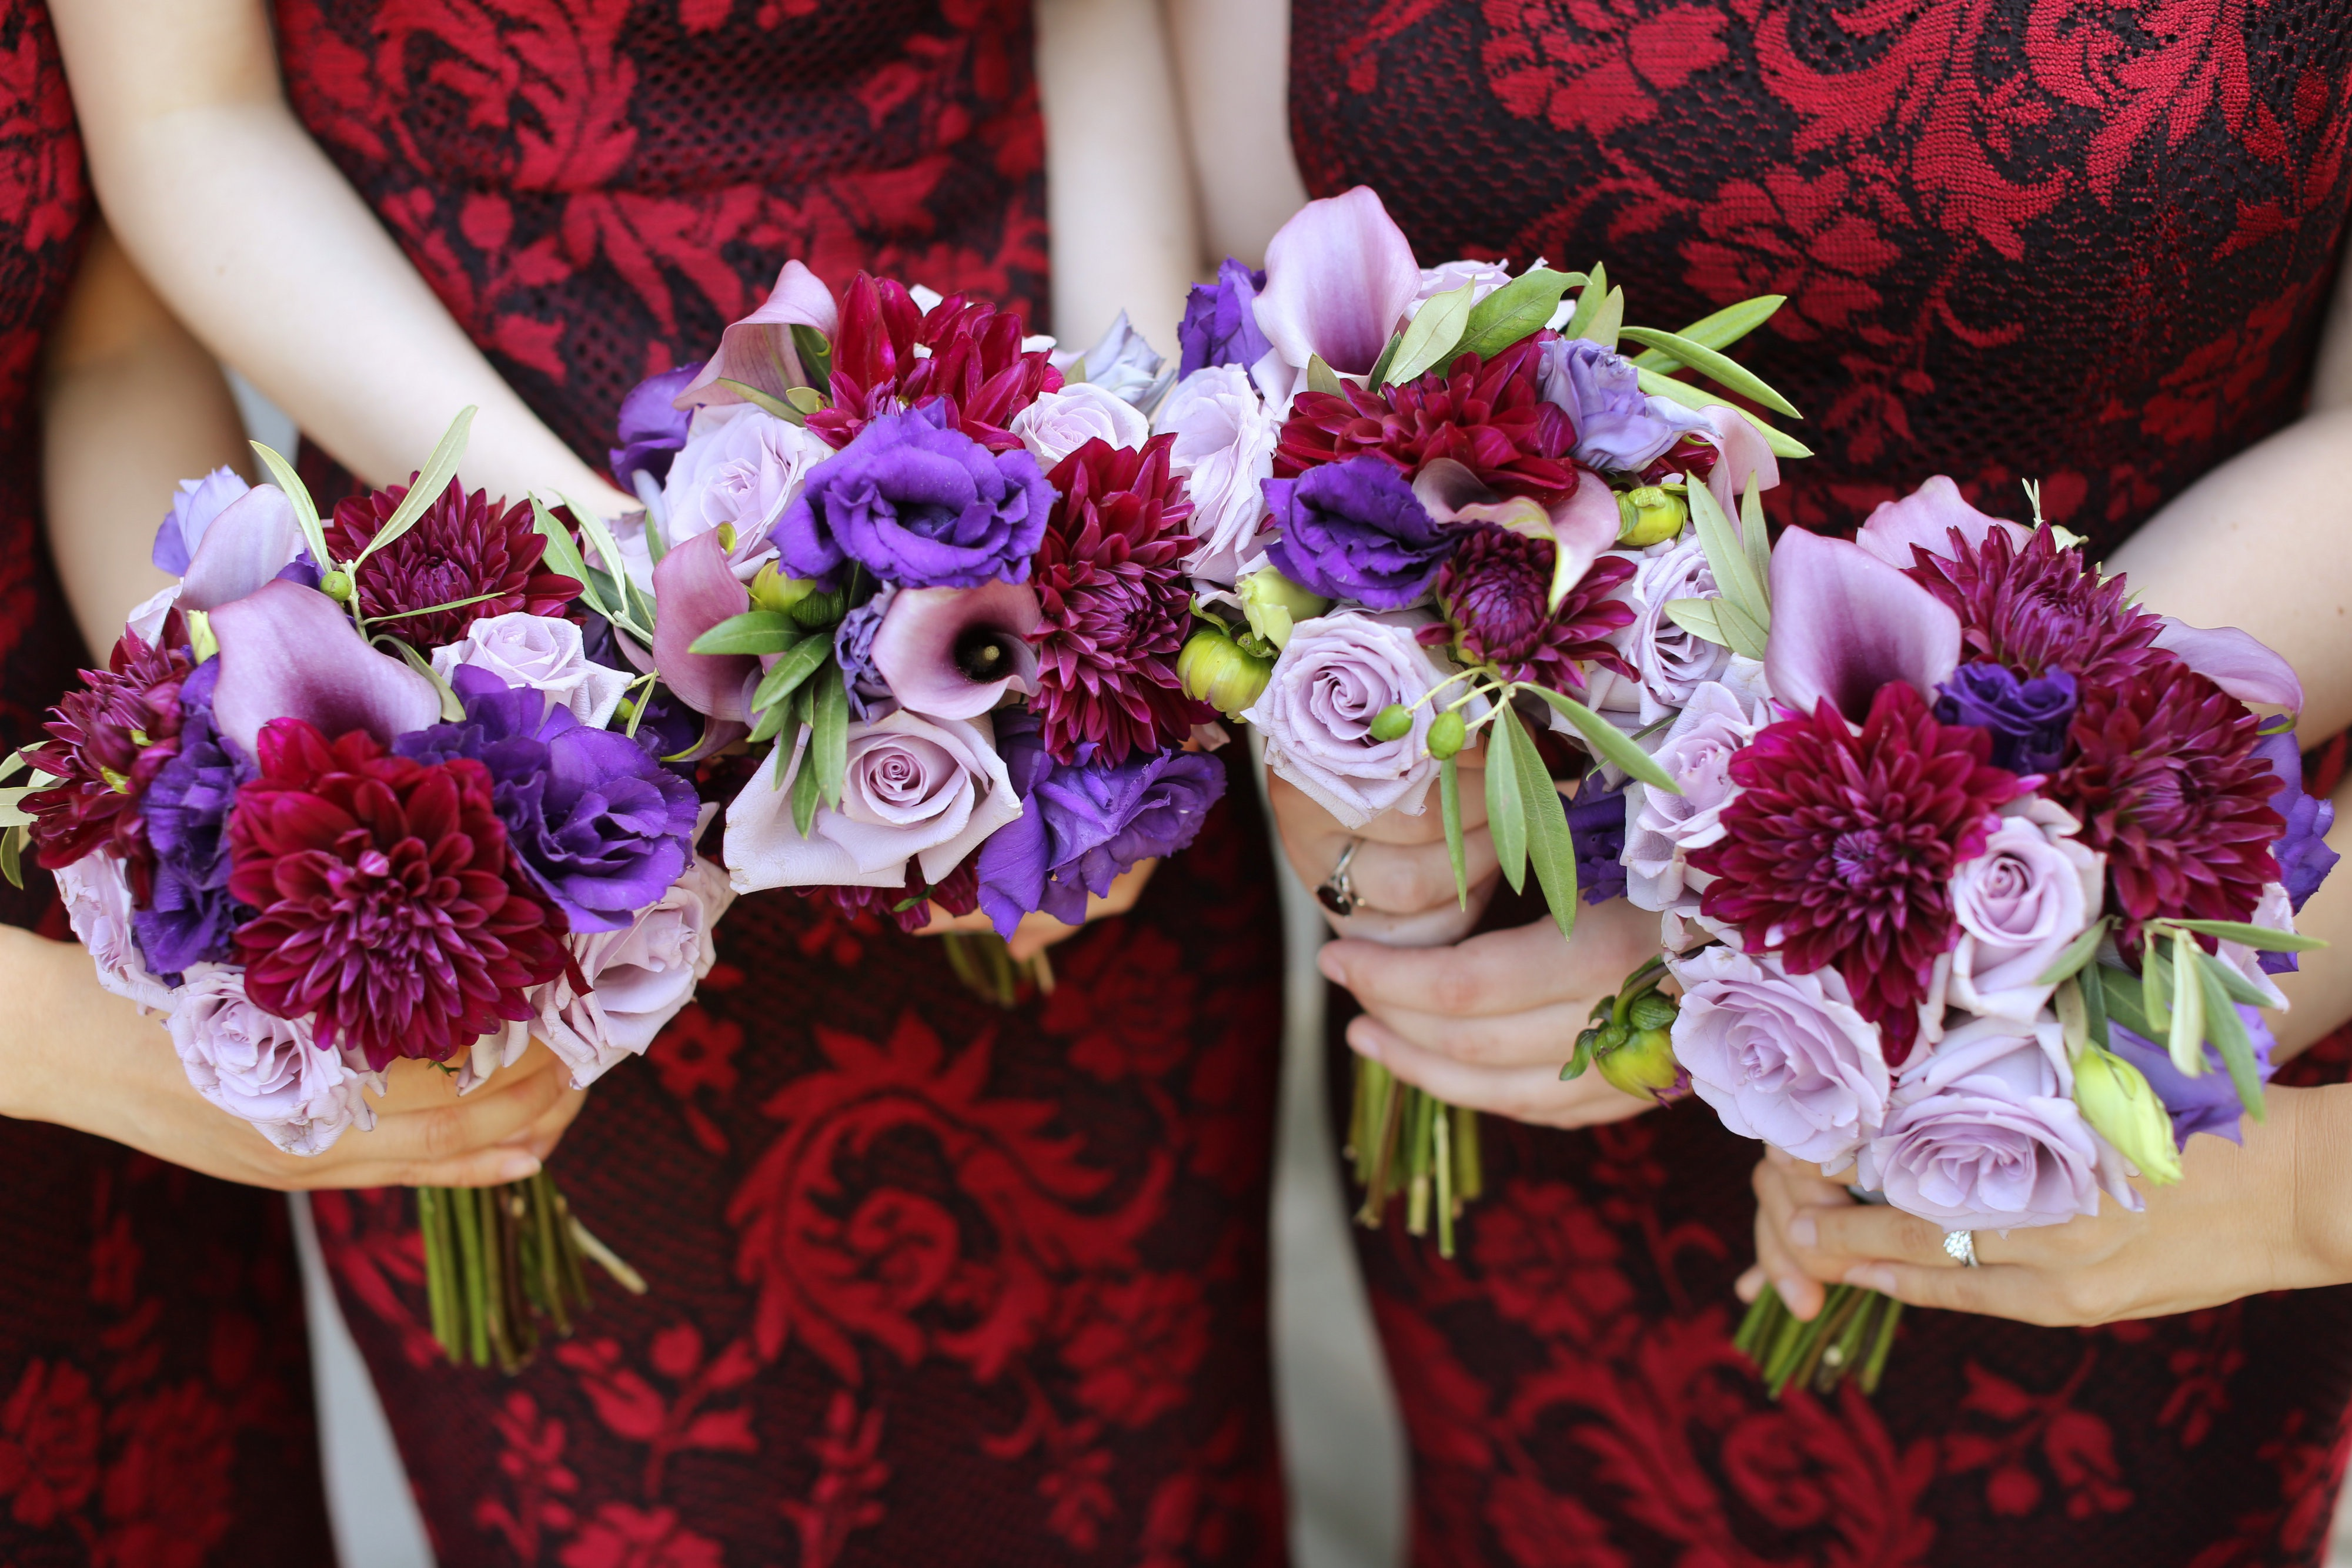 flou(-)er-specialty-floral-events-dahlia-bridesmaid-bouquets-boston-designer